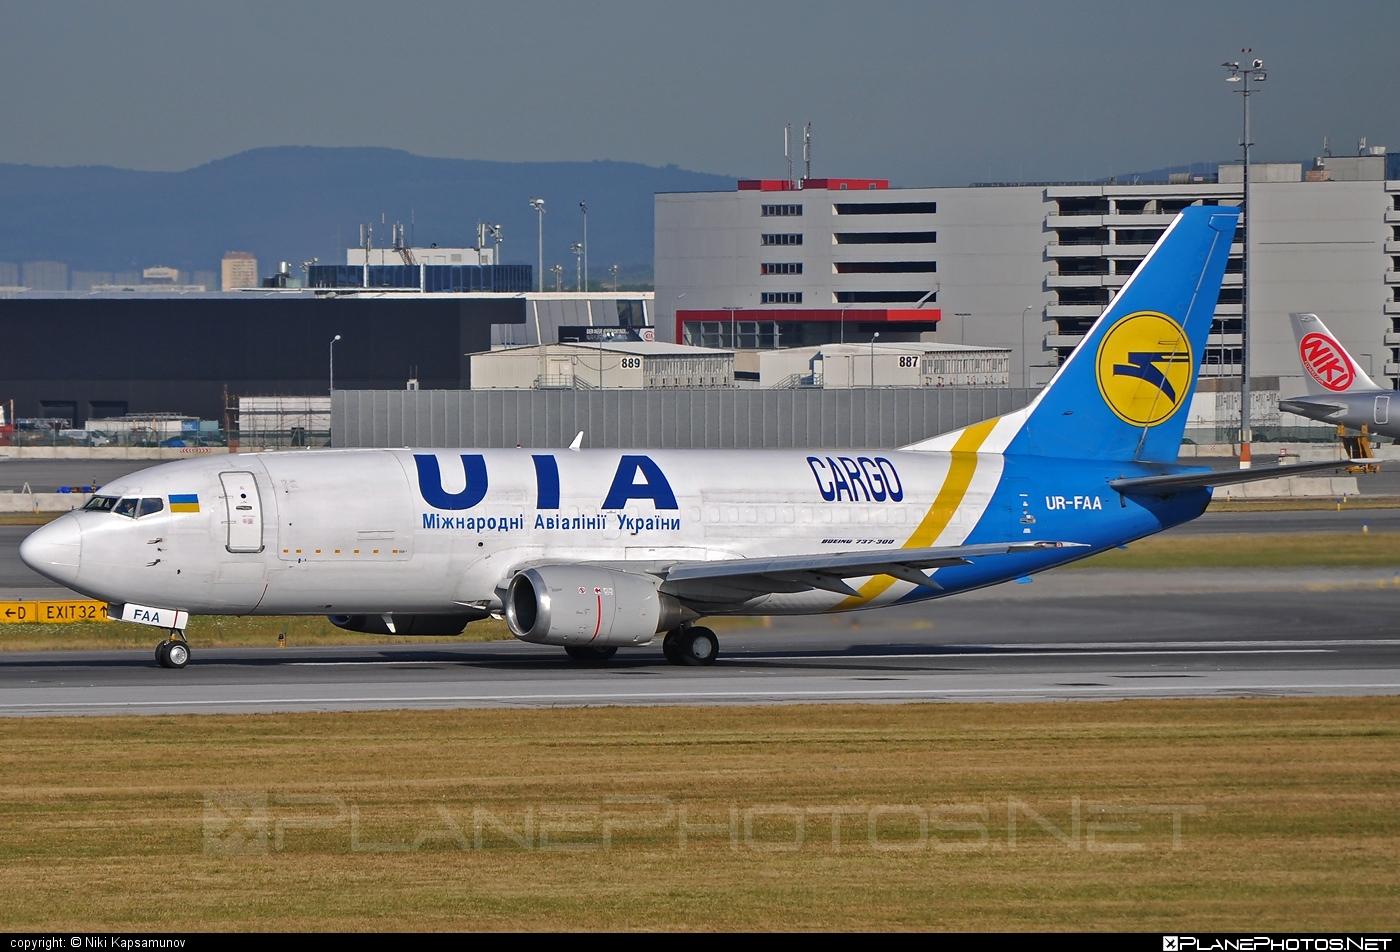 Boeing 737-300F - UR-FAA operated by Ukraine International Airlines Cargo #b737 #b737f #b737freighter #boeing #boeing737